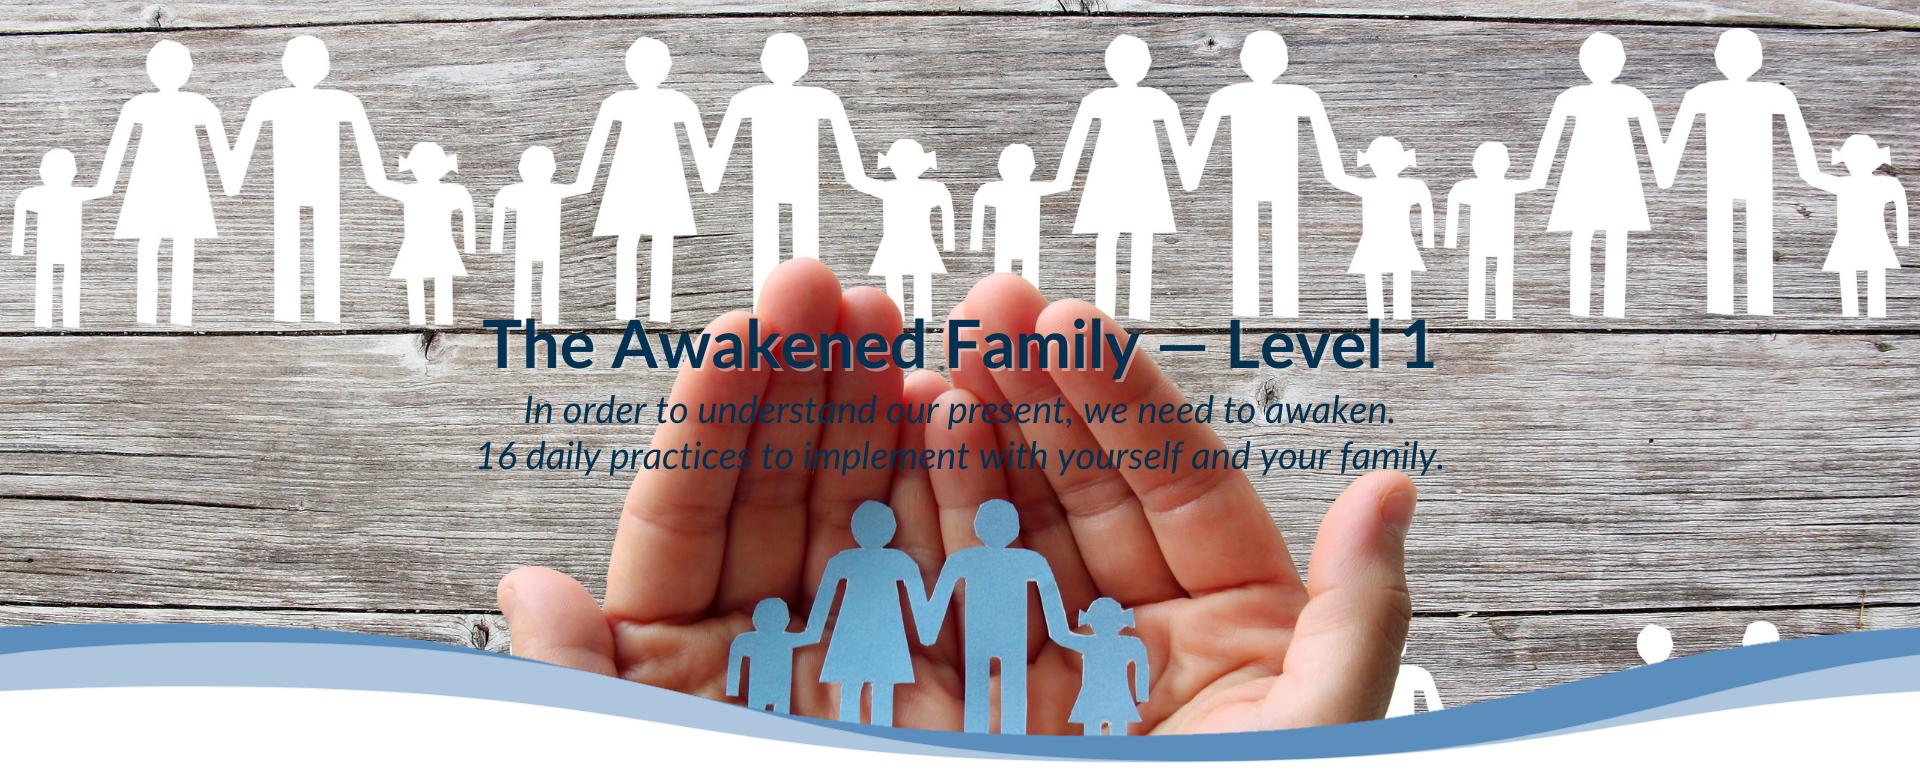 The Awakened Family Level 1